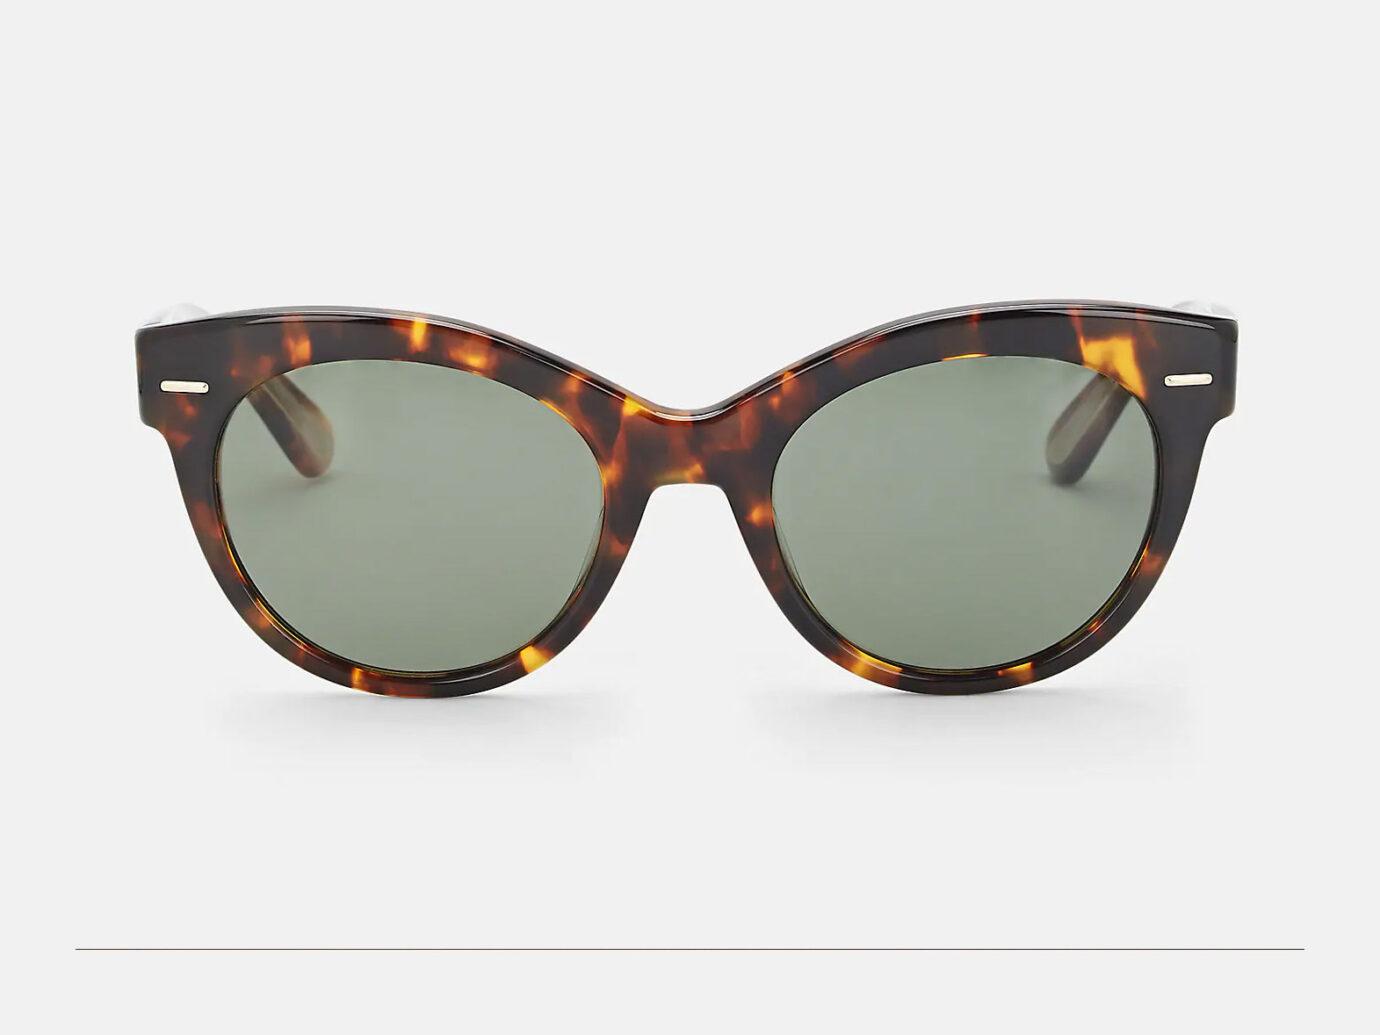 Oliver People The Row Georgica Sunglasses